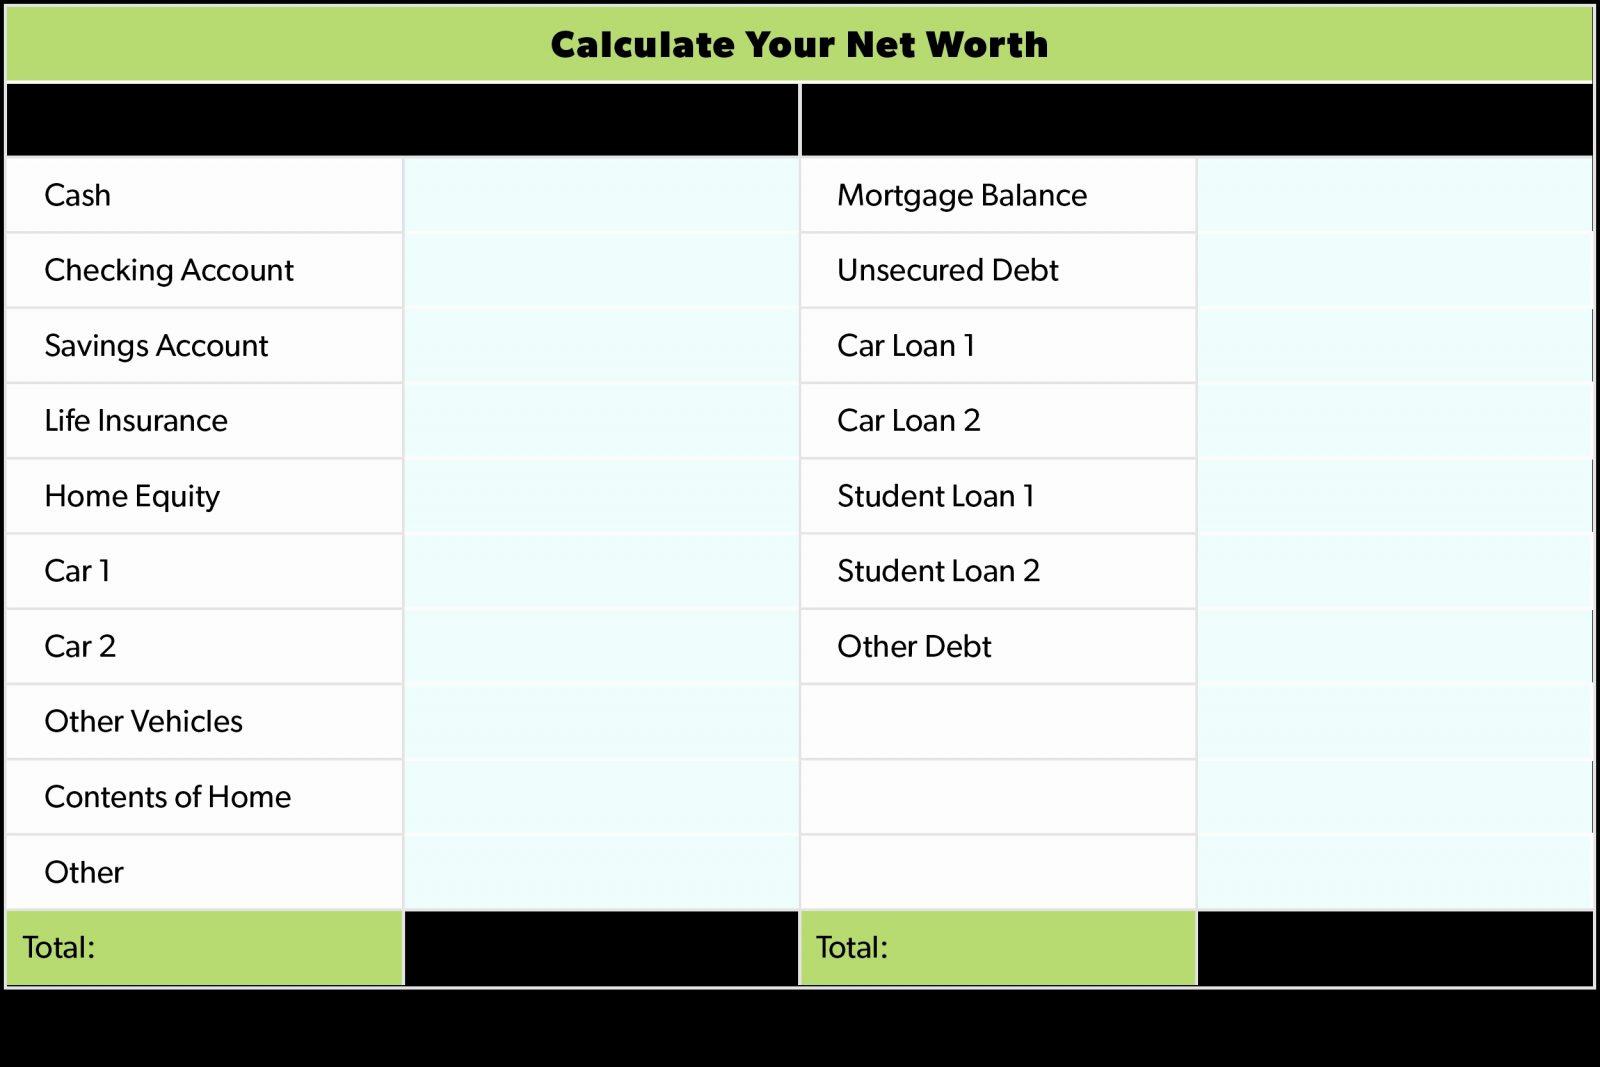 Contents Insurance Calculator Spreadsheet Spreadsheet Downloa Contents Insurance Calculator